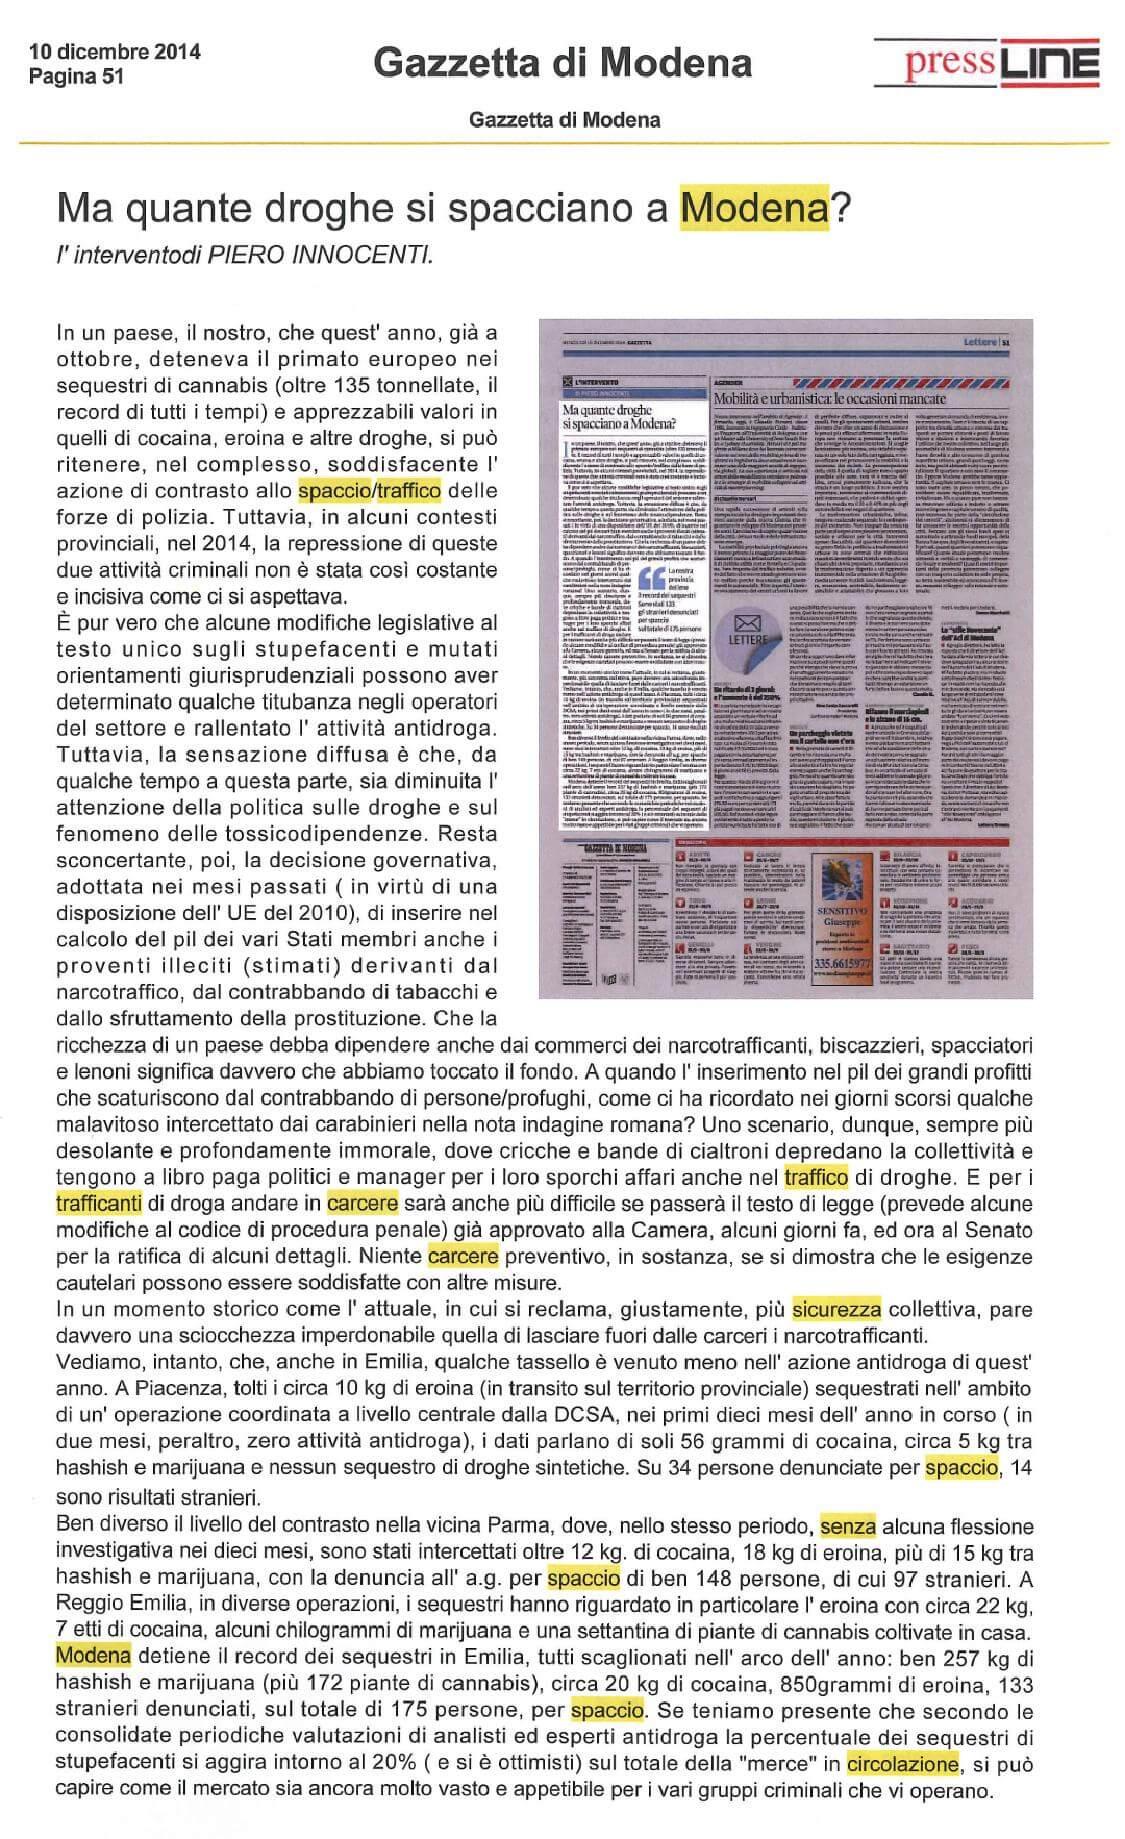 10_12_14_gdm_p51-page-001-1-1